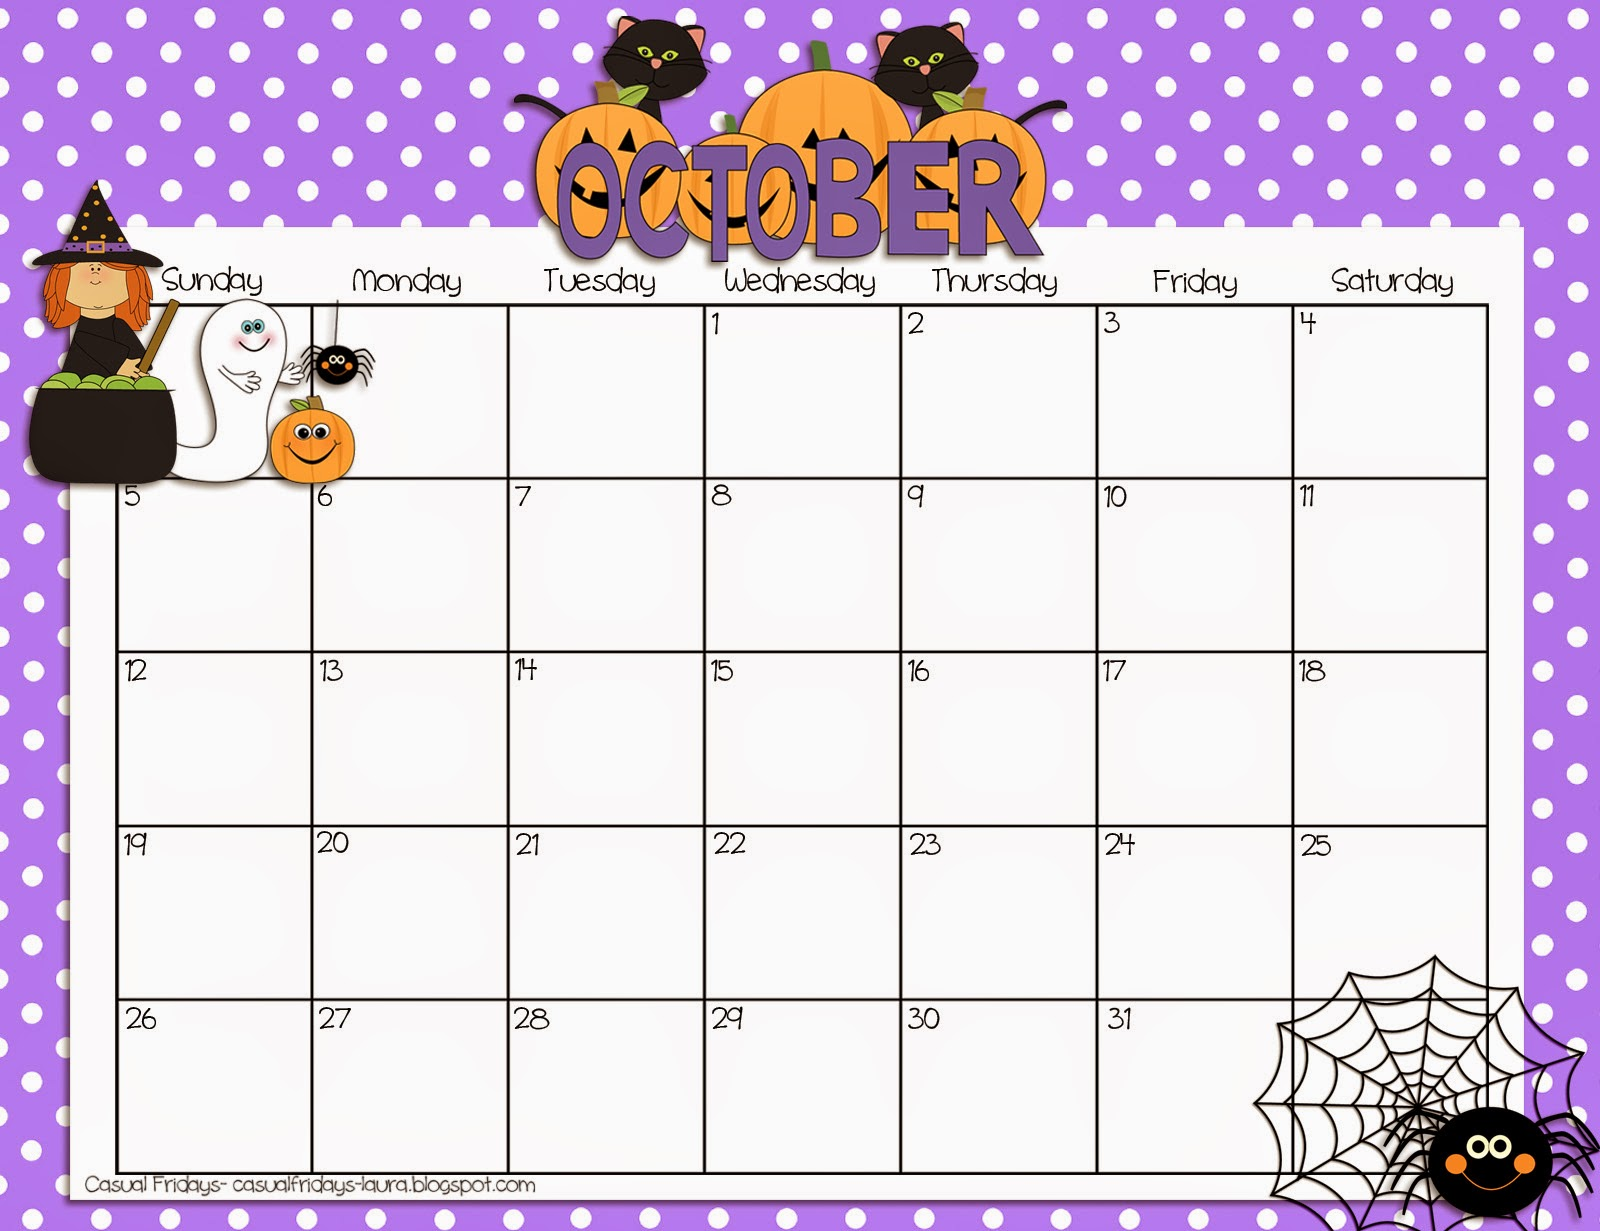 Casual Fridays: Organizing